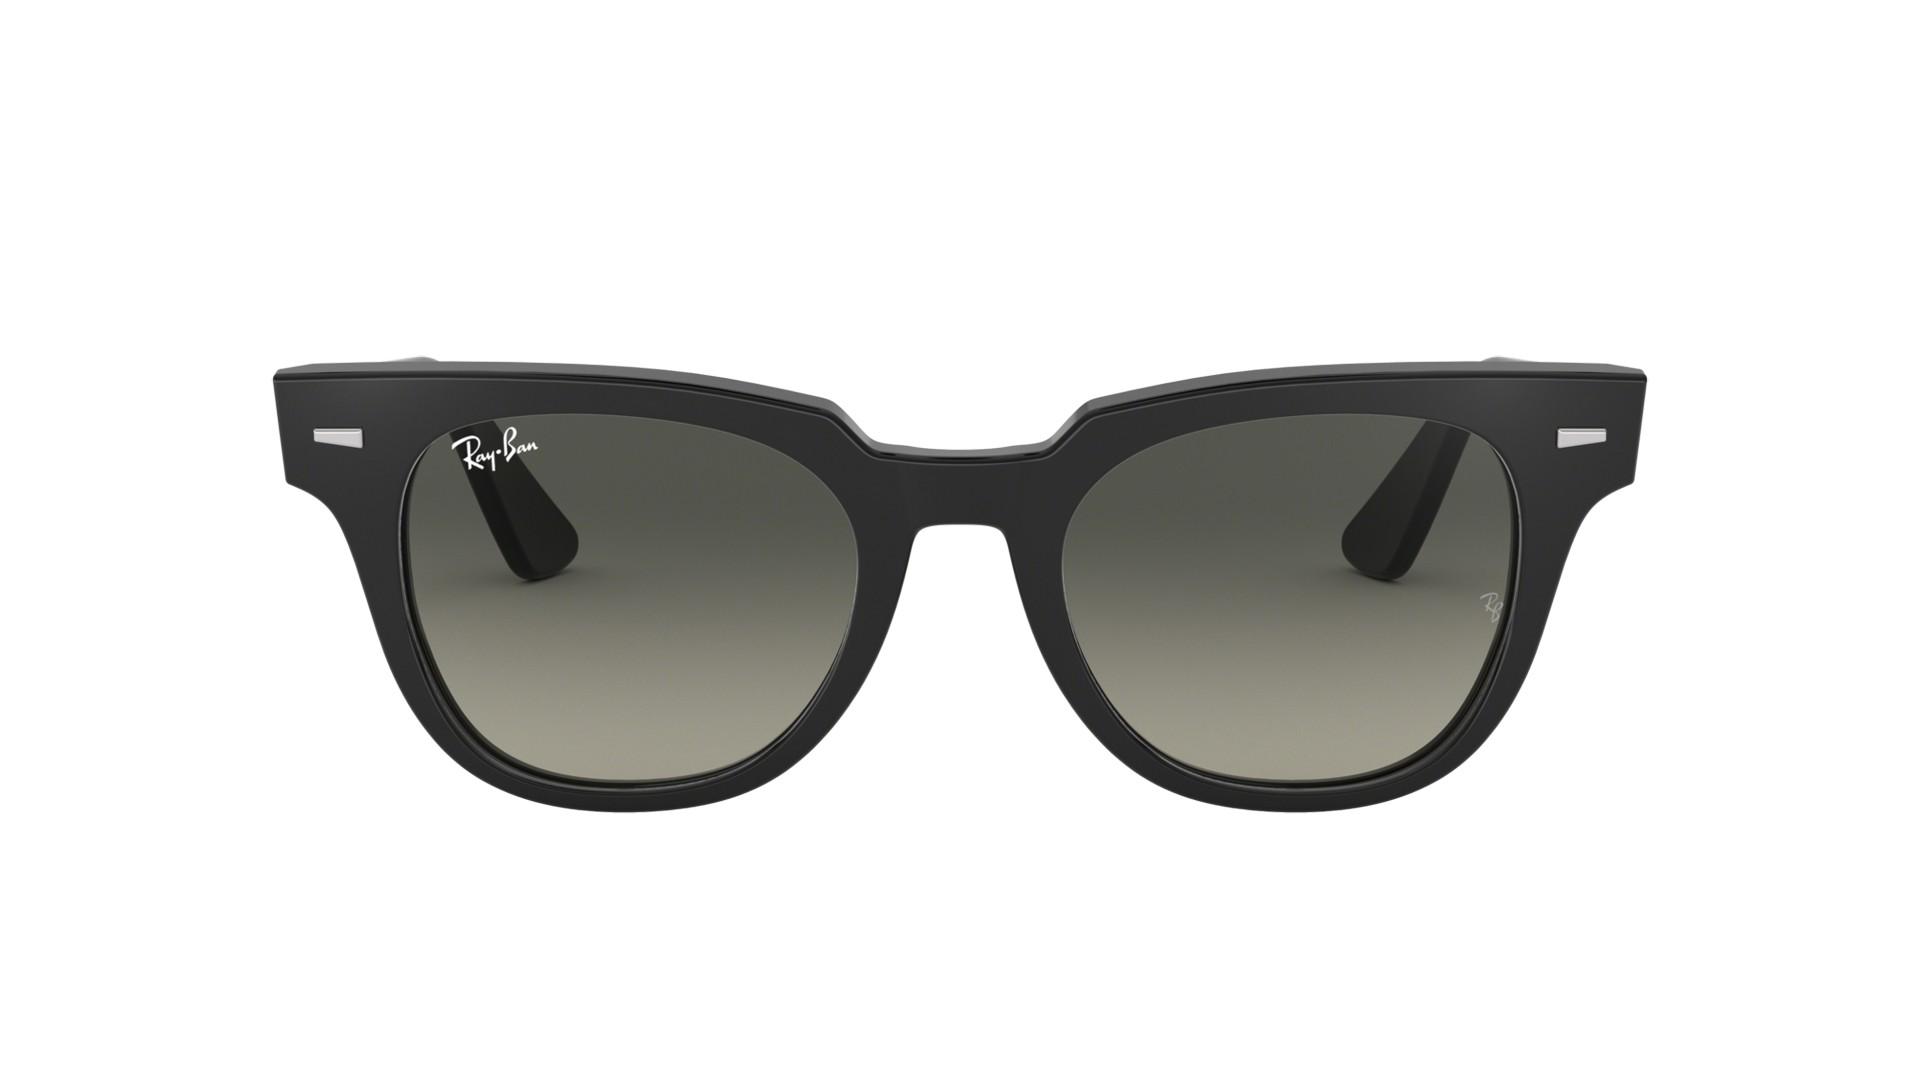 705b652645 Sunglasses Ray-Ban Meteor Classic black RB2168 901 71 50-20 Medium Gradient